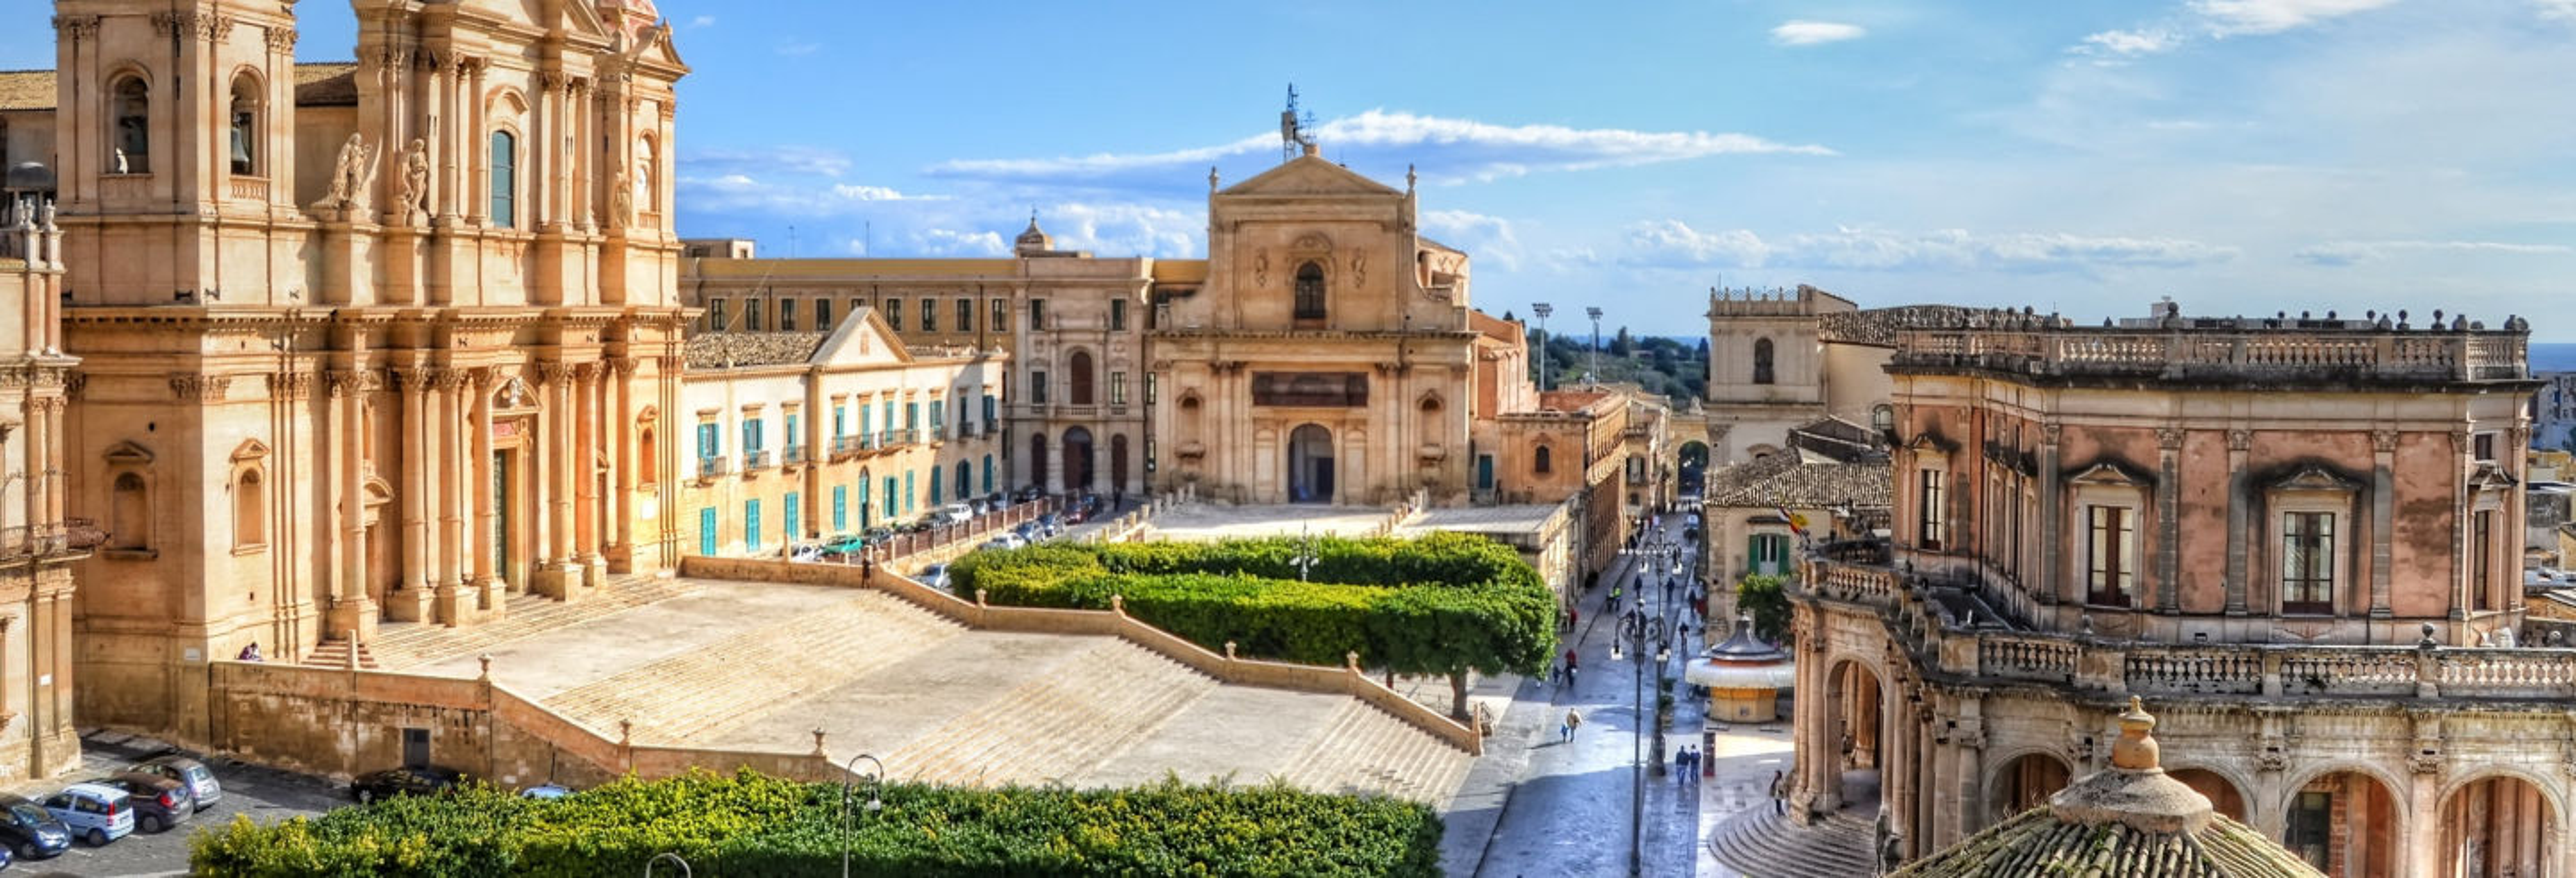 Excursión a Noto, Siracusa y Ortigia